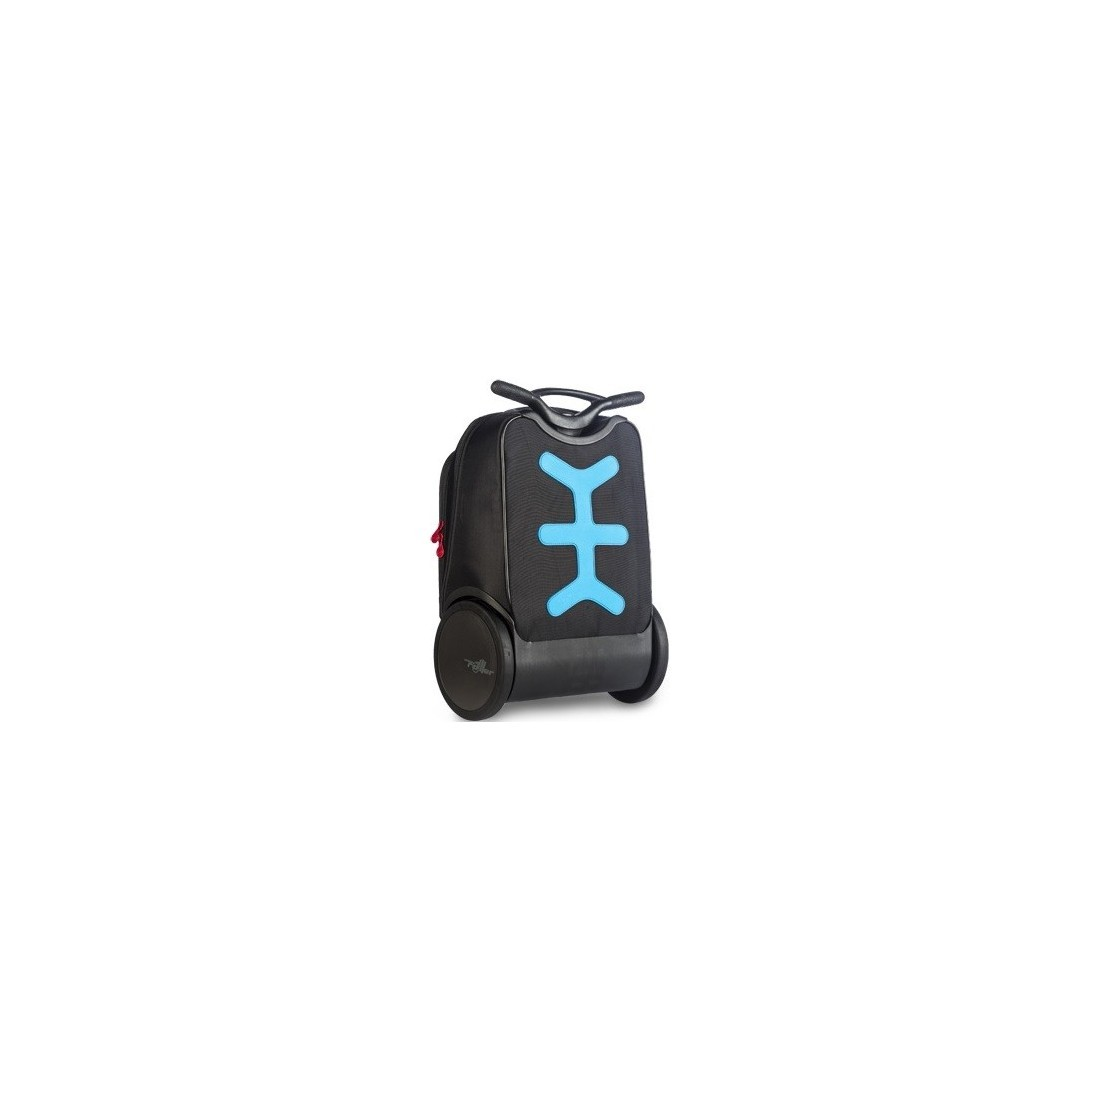 Plecak na kołkach bez szelek Roller XL Technodots dla dziewczyny - plecak-tornister.pl